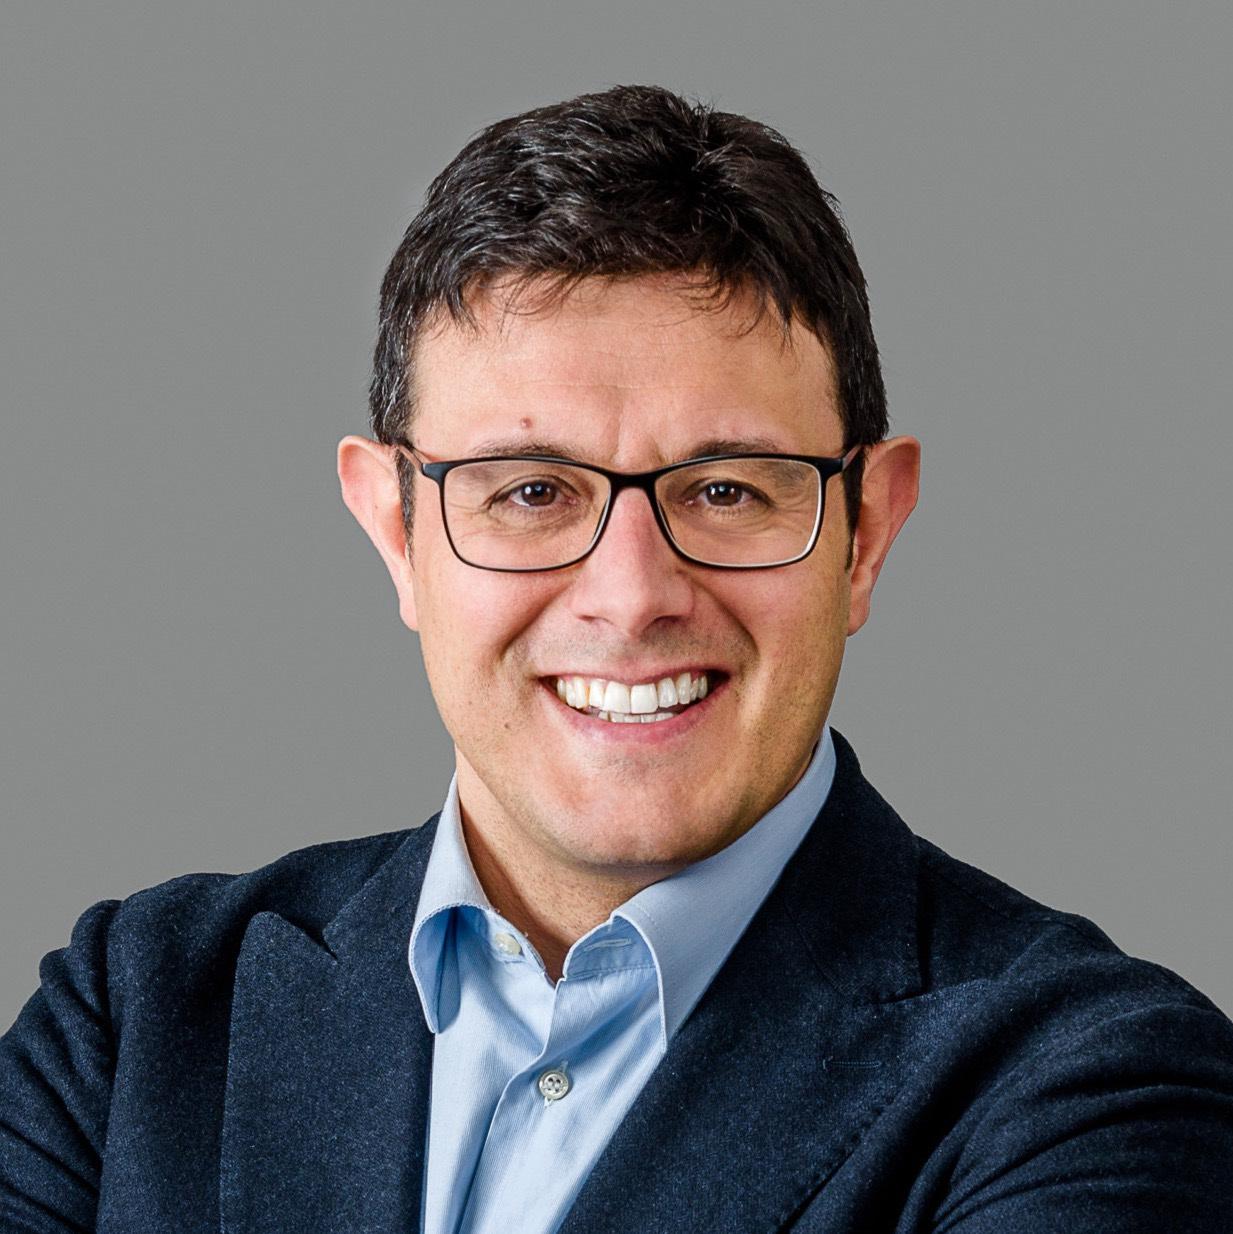 Dott. Marco Bezzi